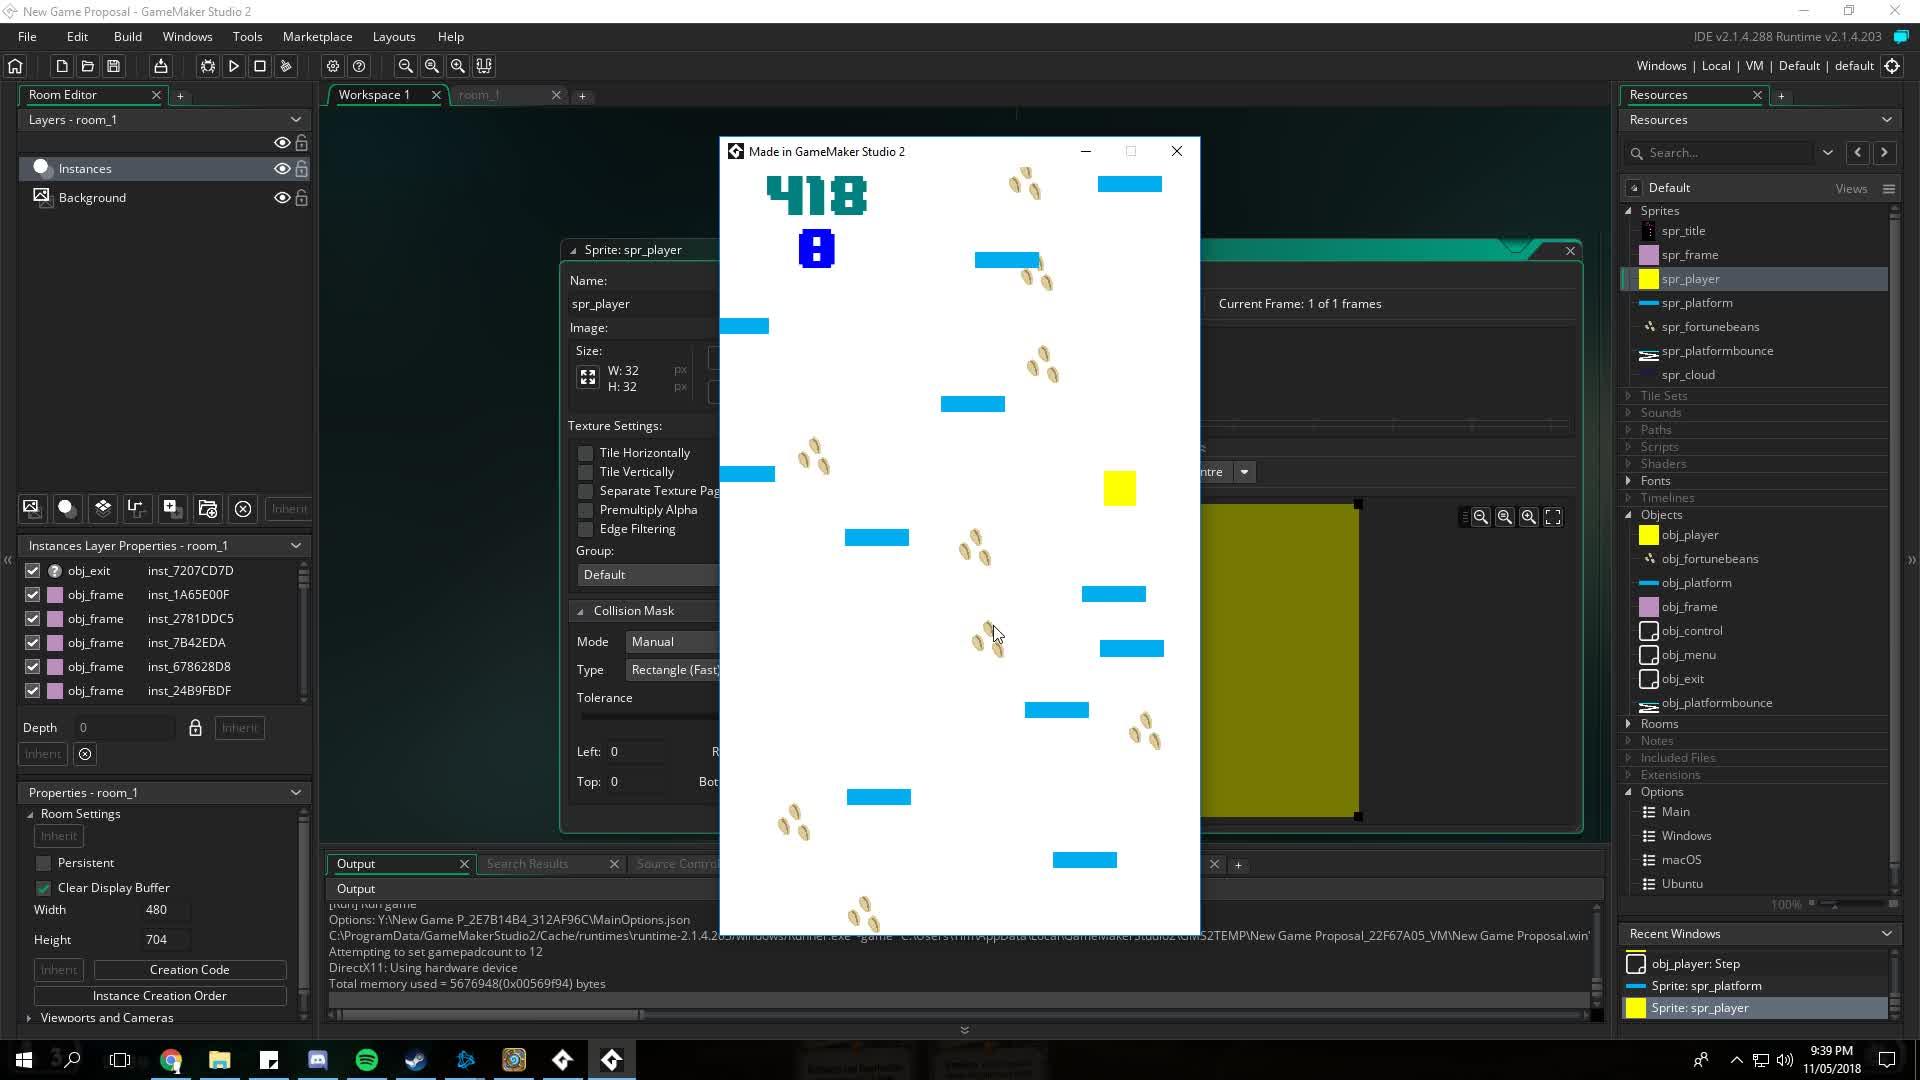 desktop, Desktop 2018.05.11 - 21.39.22.02.DVR GIFs